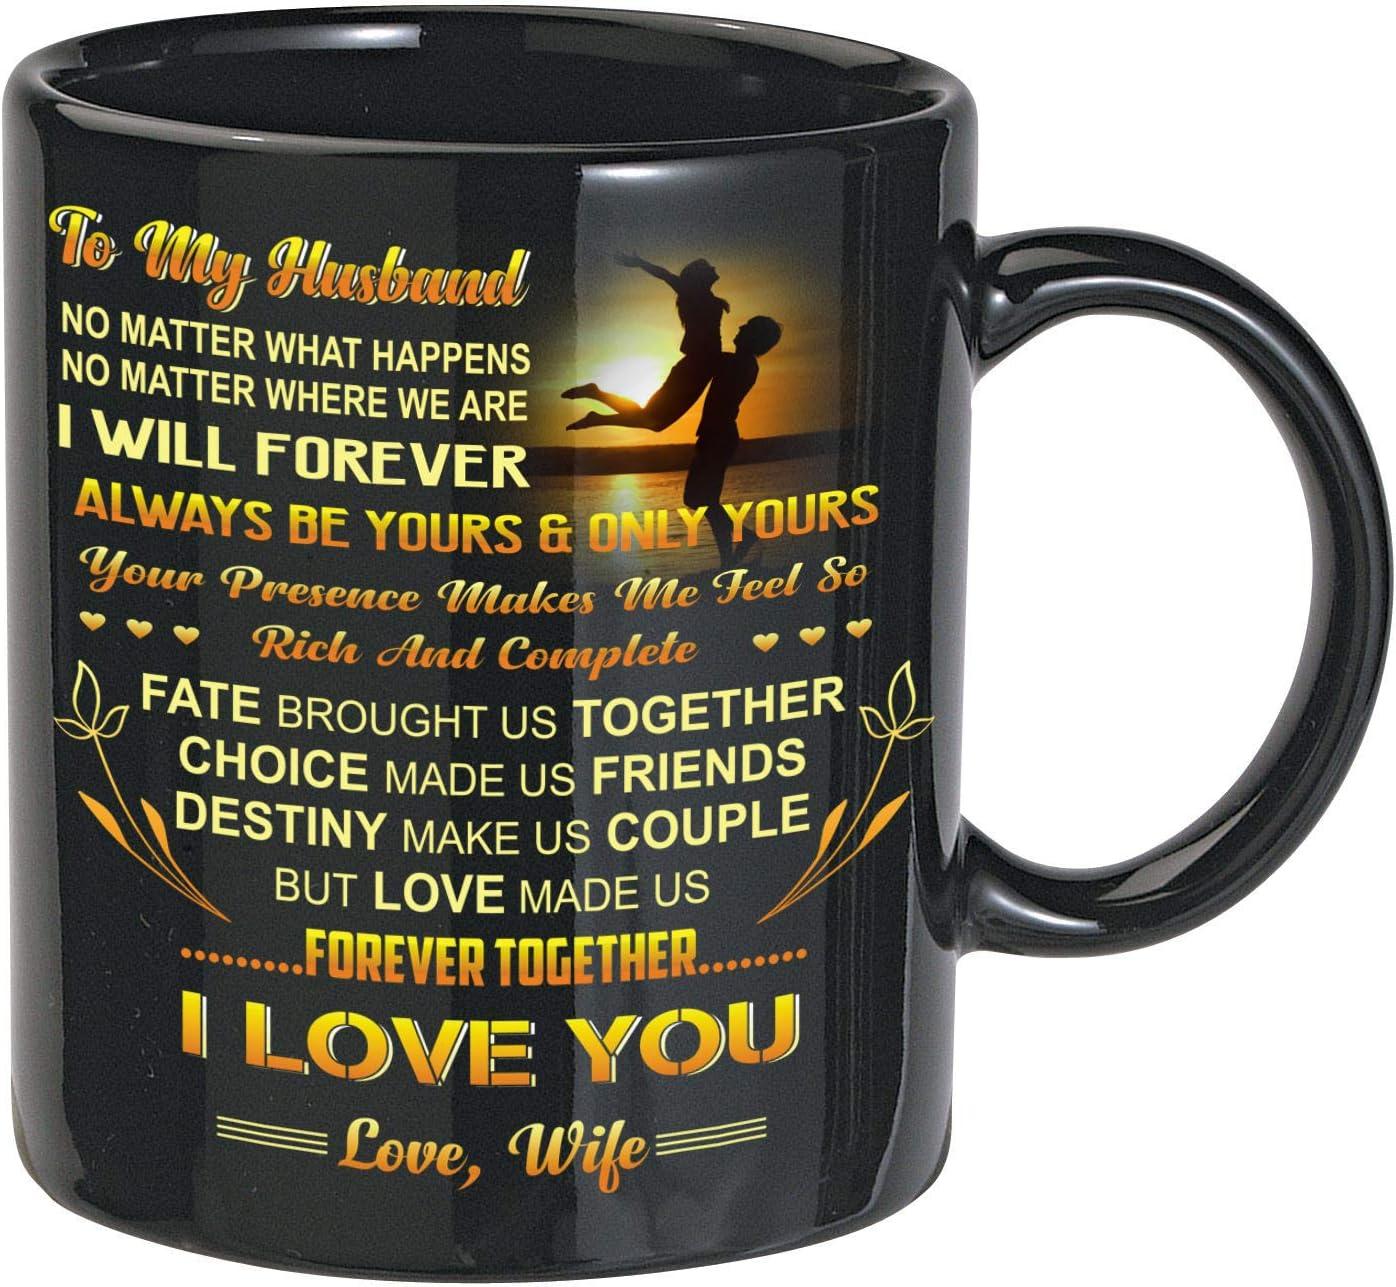 To My Husband 11oz /& 15oz Mug I Love You Perfect gift for Valentine's Day